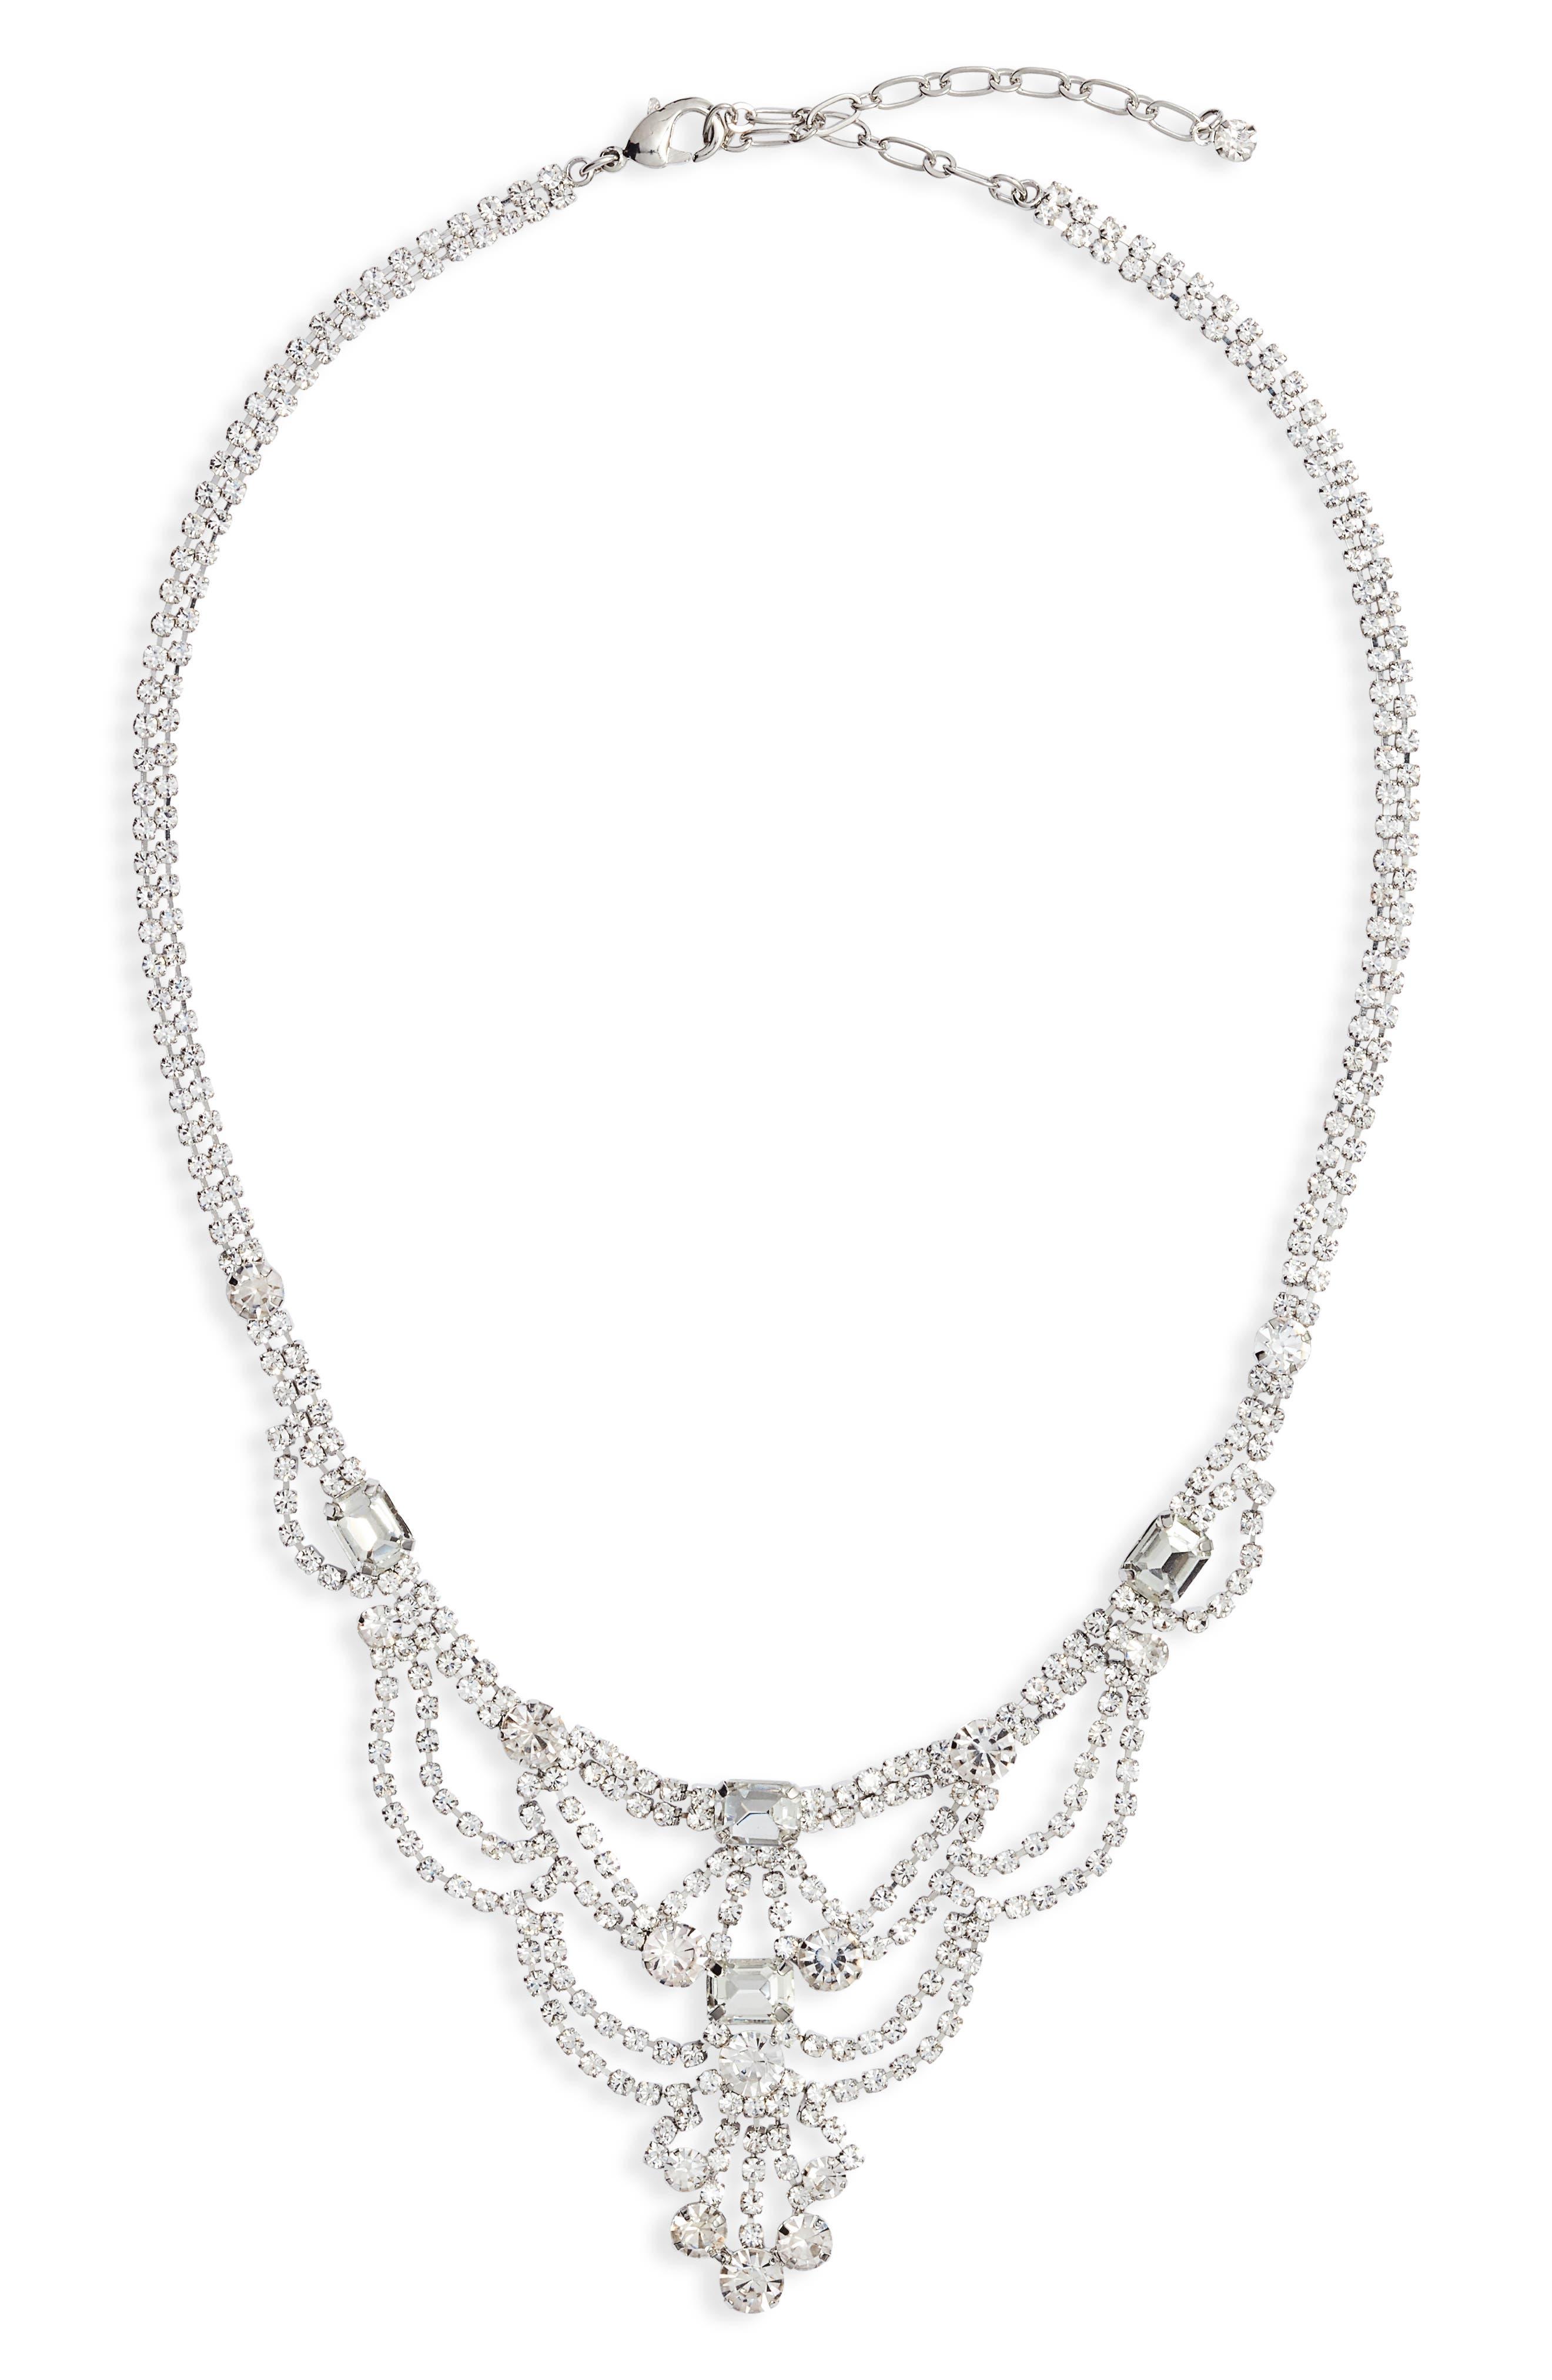 Drape Frontal Necklace